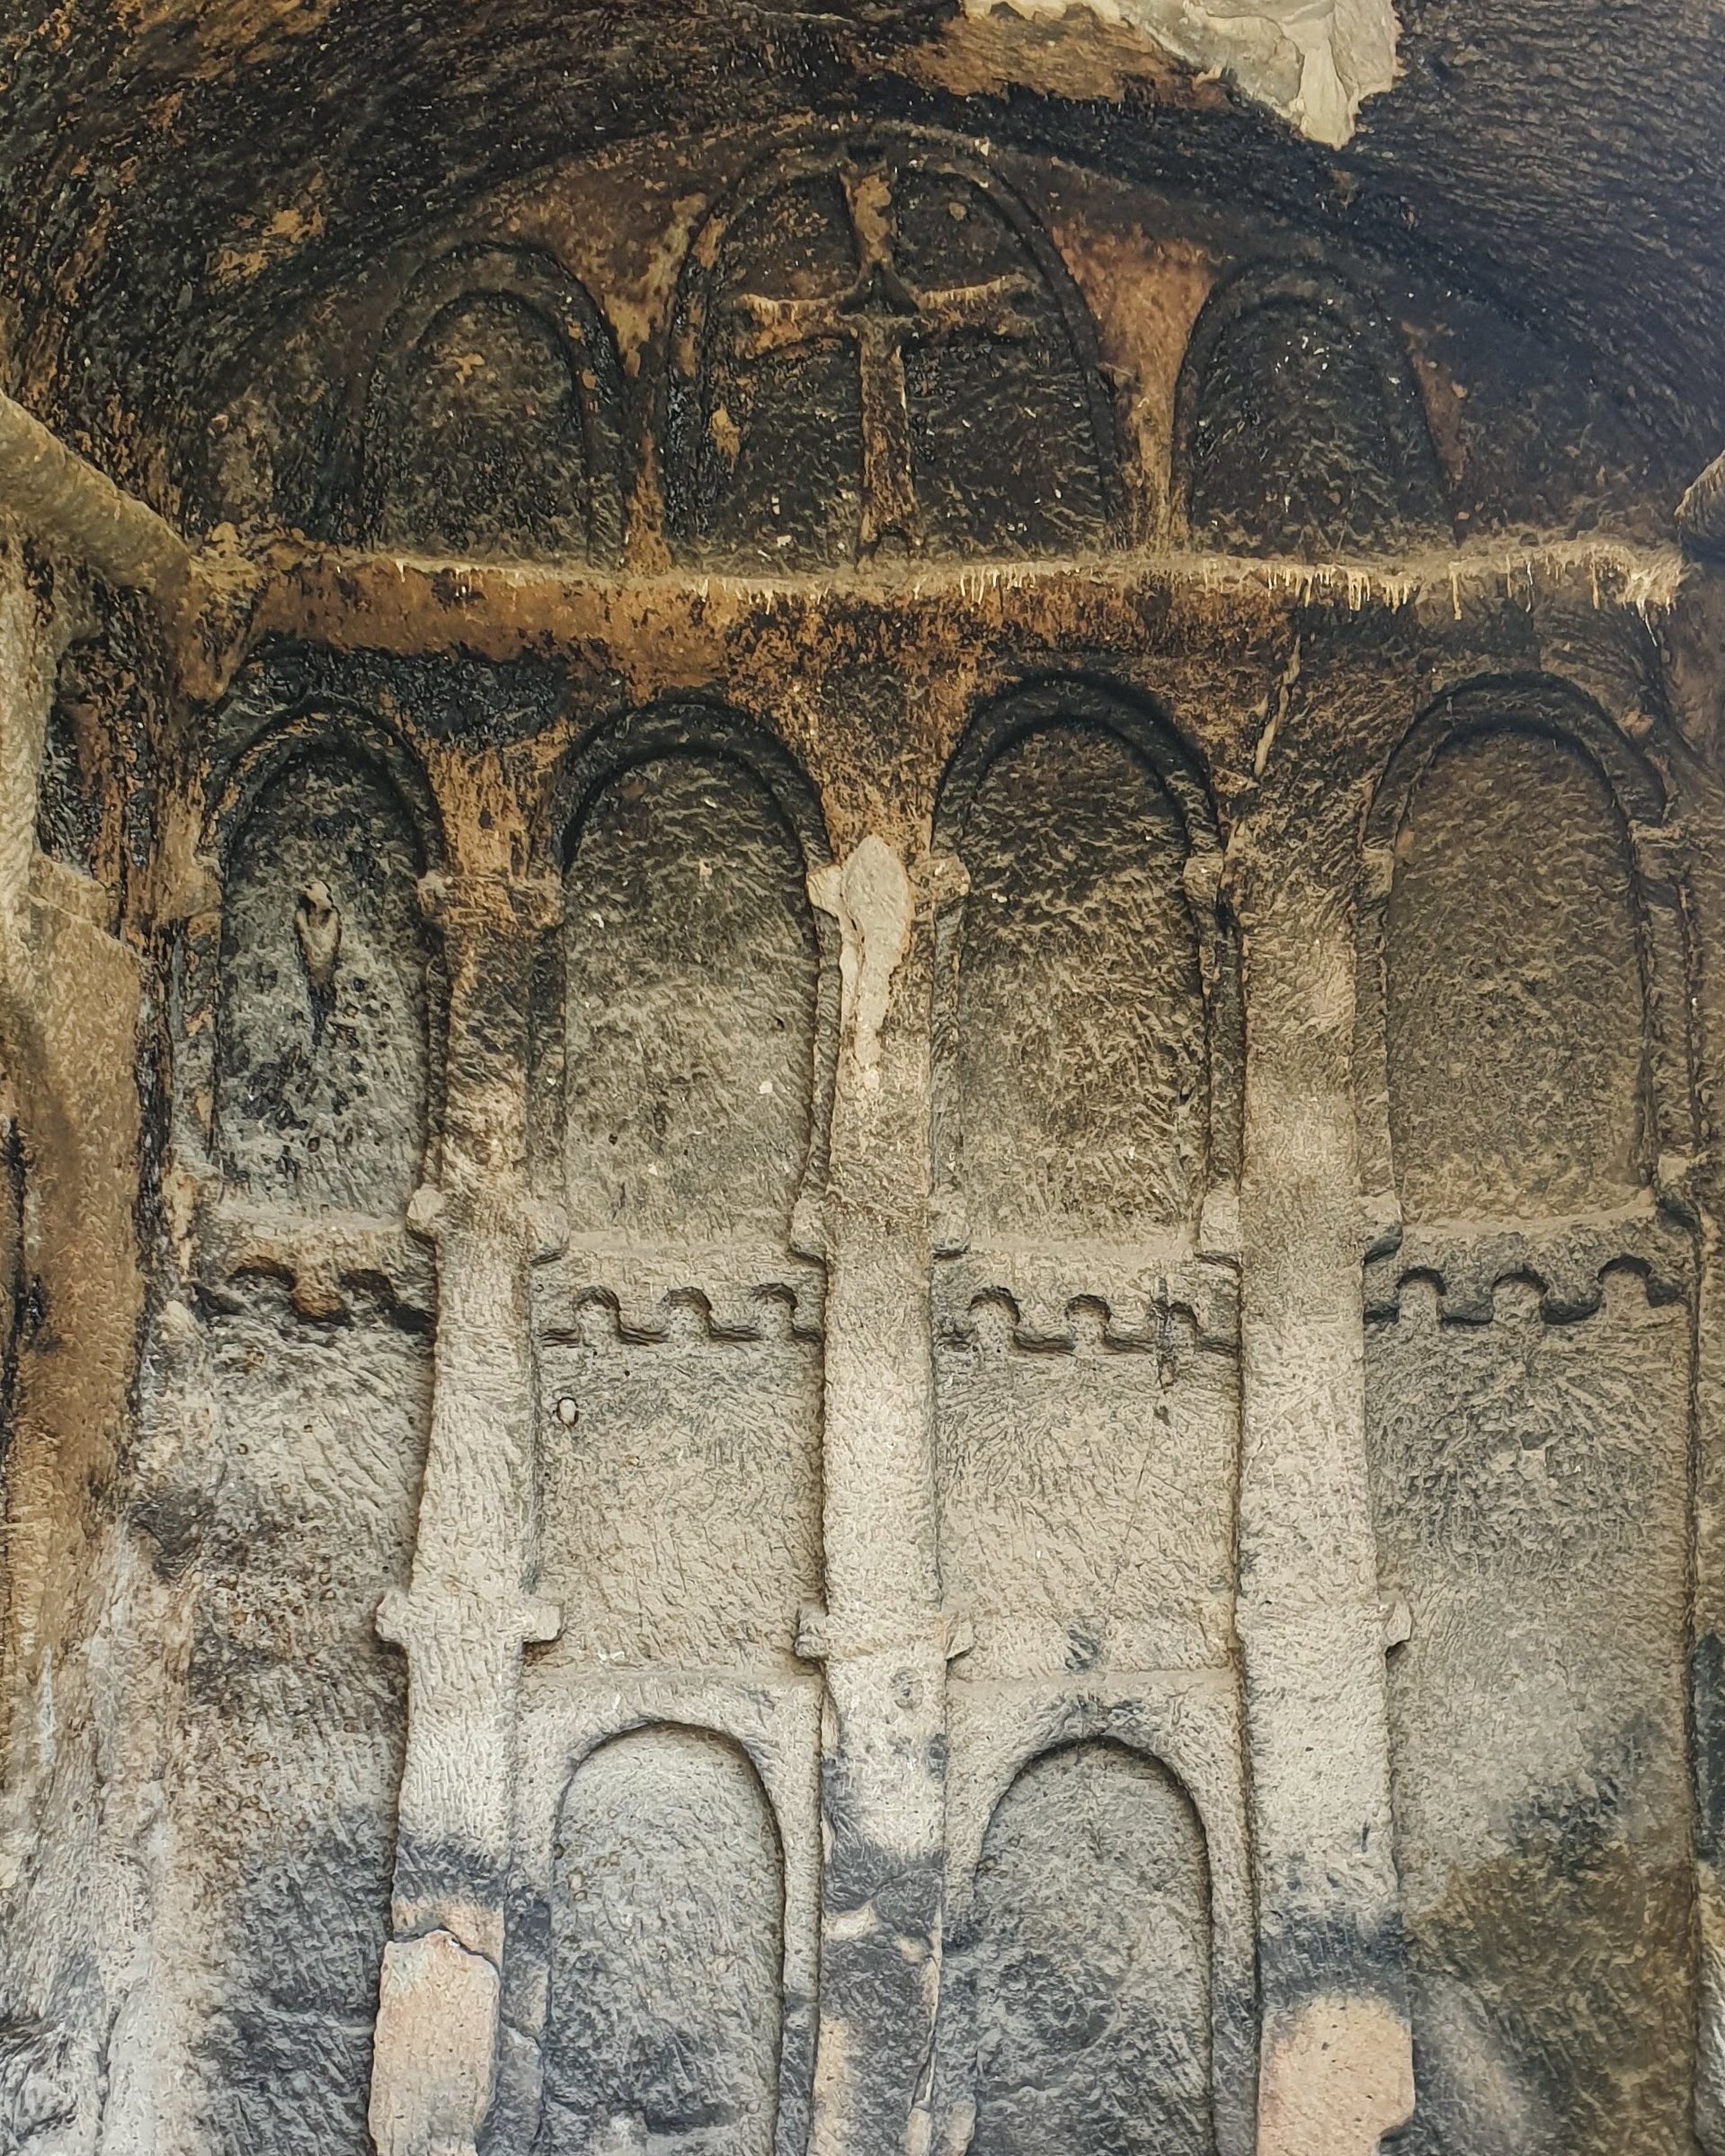 Une église rupestre à Mahkemeağcin, Kızılcahamam à Ankara.  (Photo par Argun Konuk)